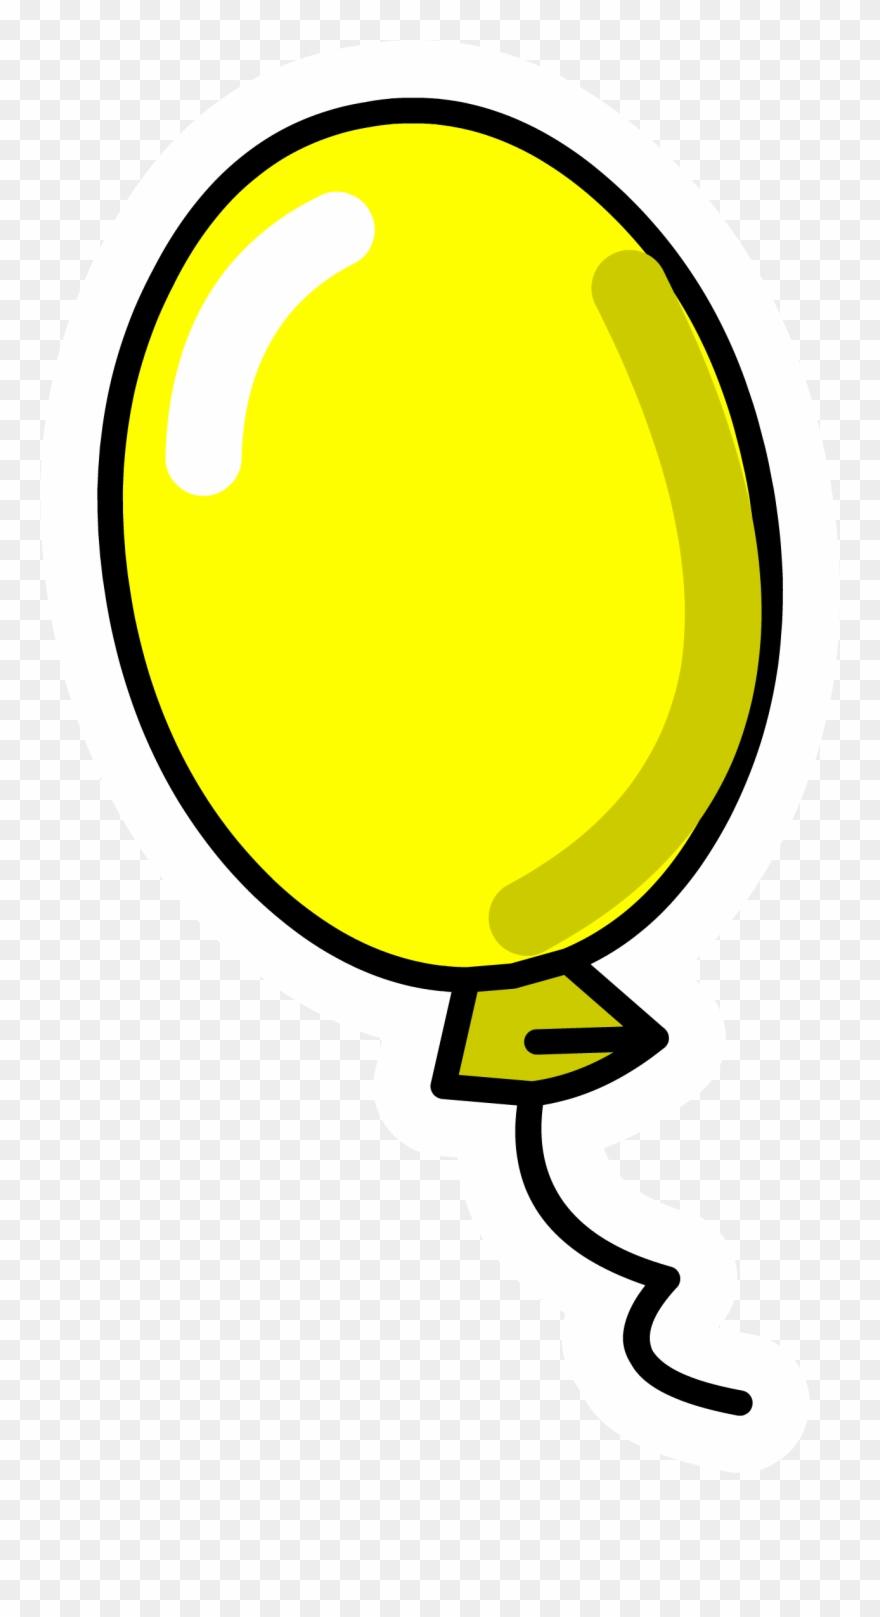 Image Balloon Club Penguin